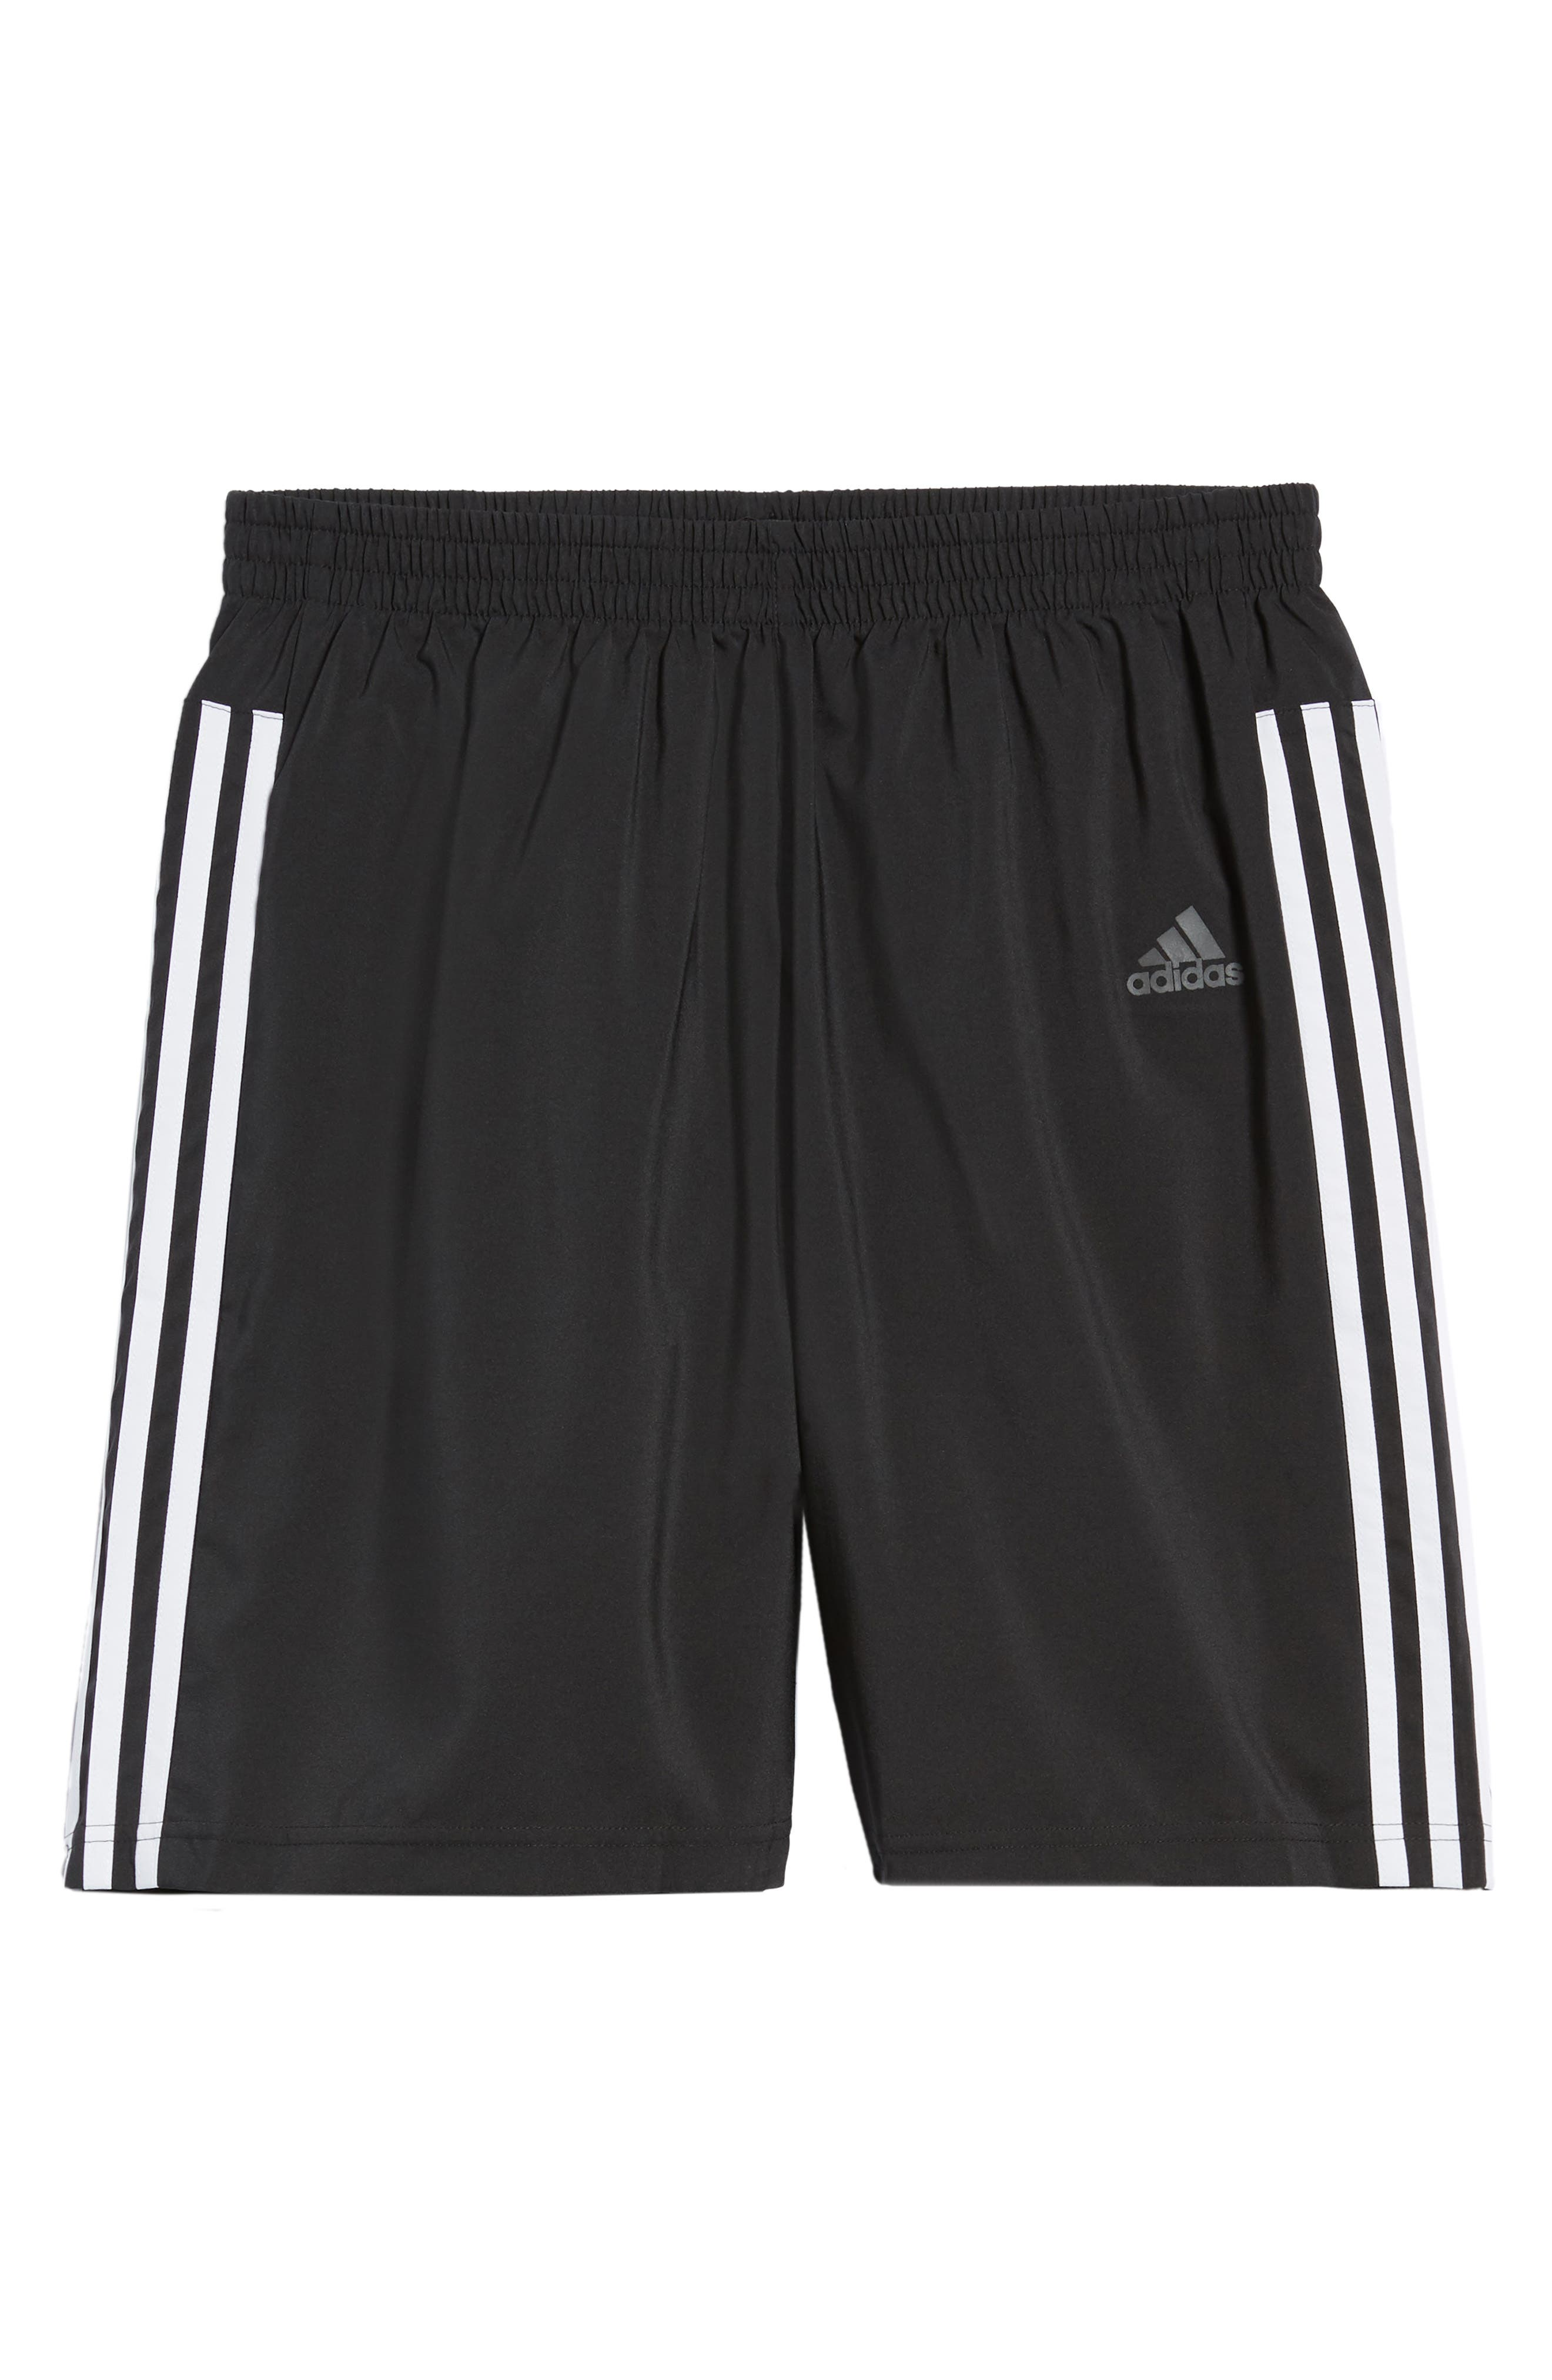 Run 3S Regular Fit Shorts,                             Alternate thumbnail 6, color,                             001